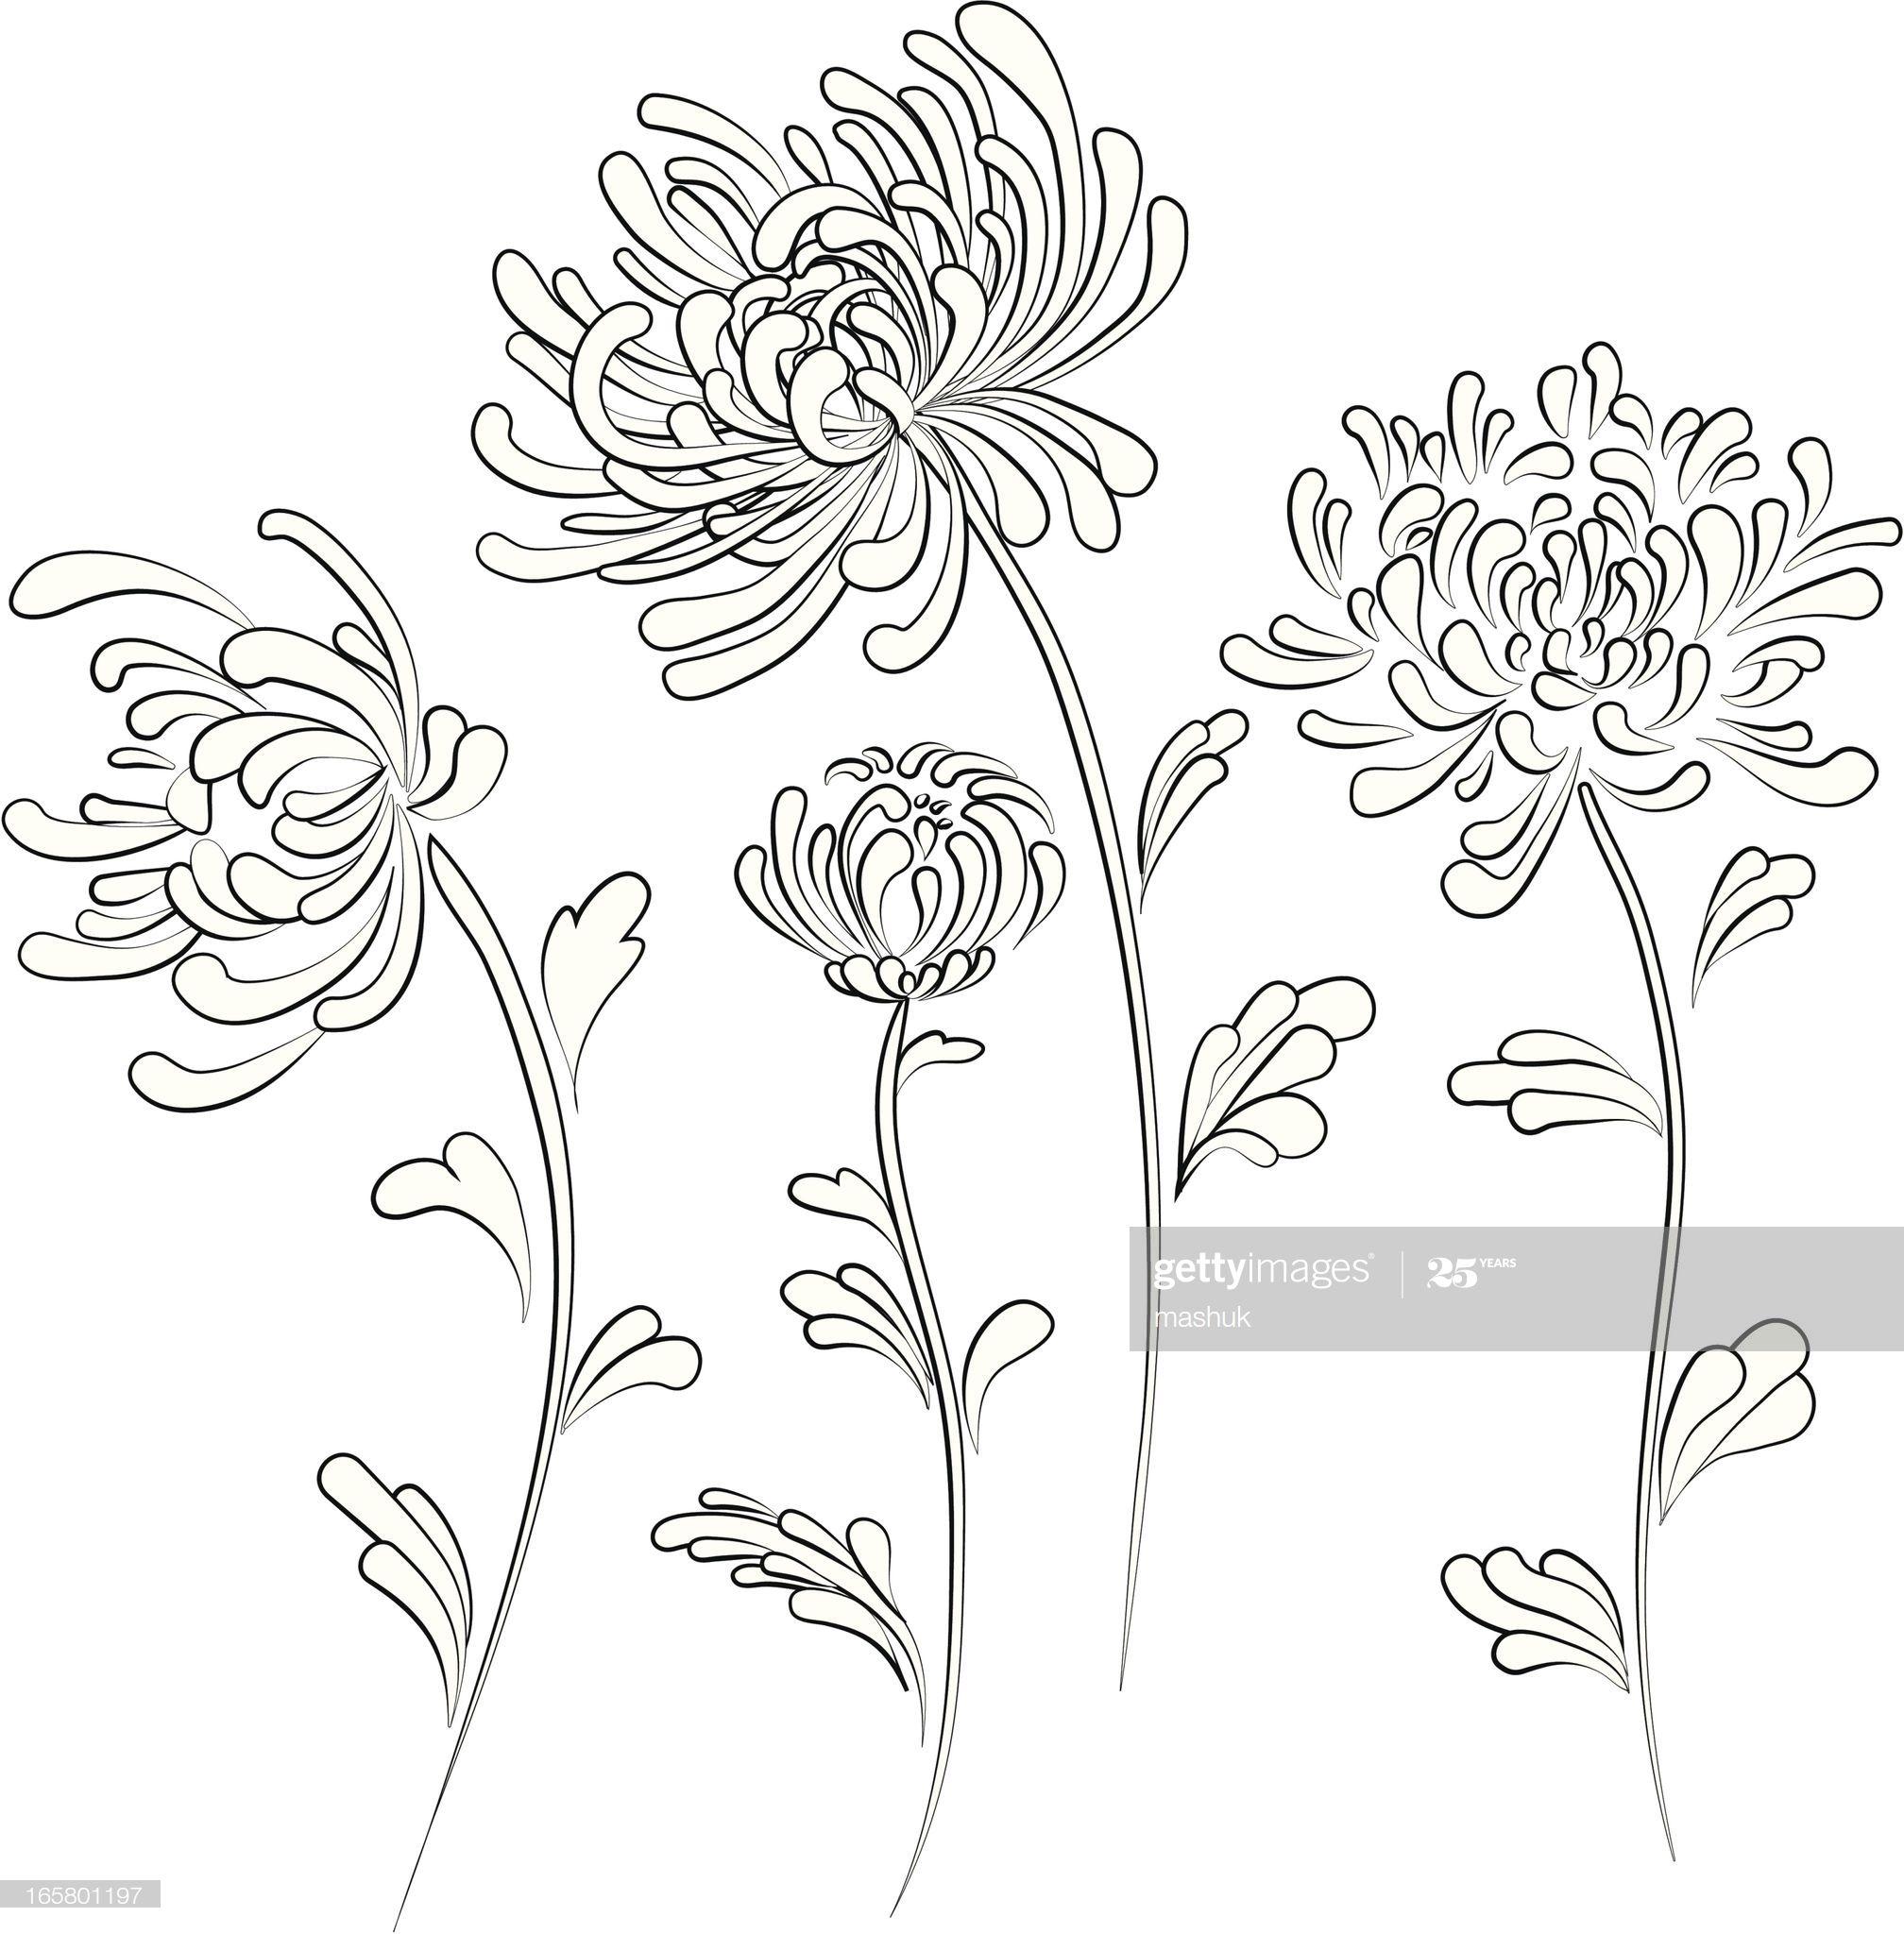 Chrysanthemum In 2020 Chrysanthemum Drawing Chrysanthemum Vector Art